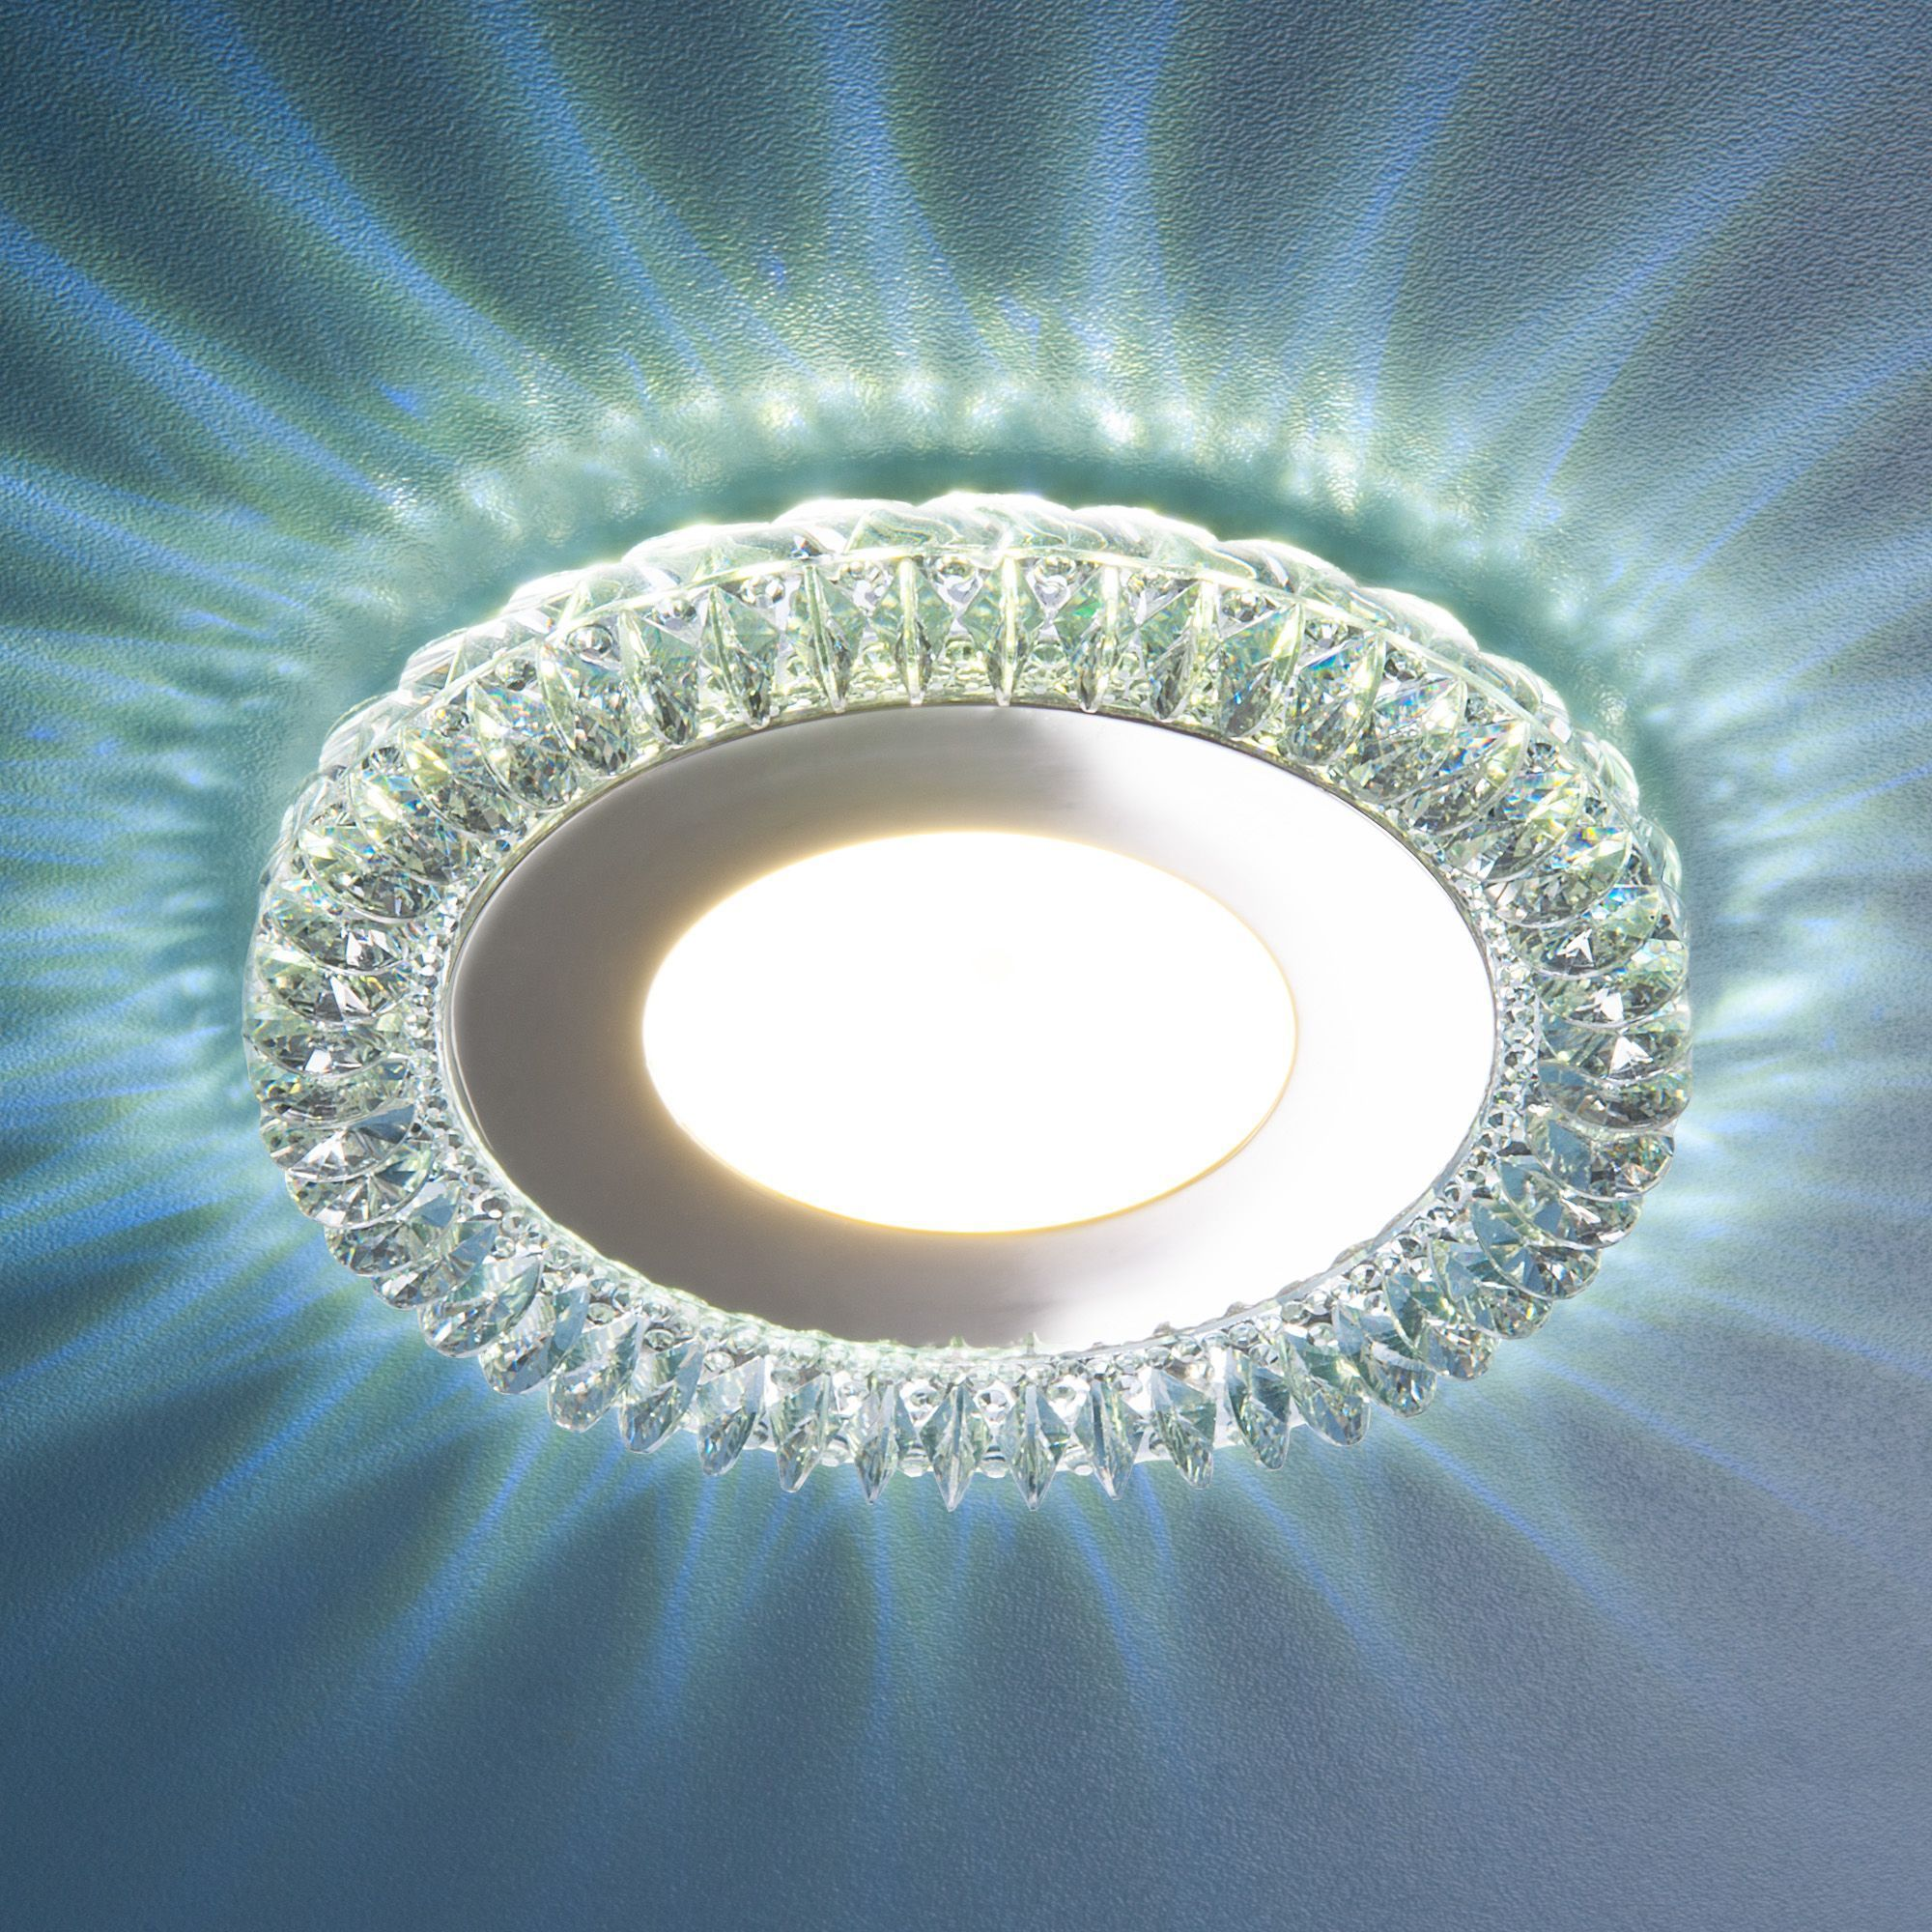 Точечный светильник с LED подсветкой 9908 LED